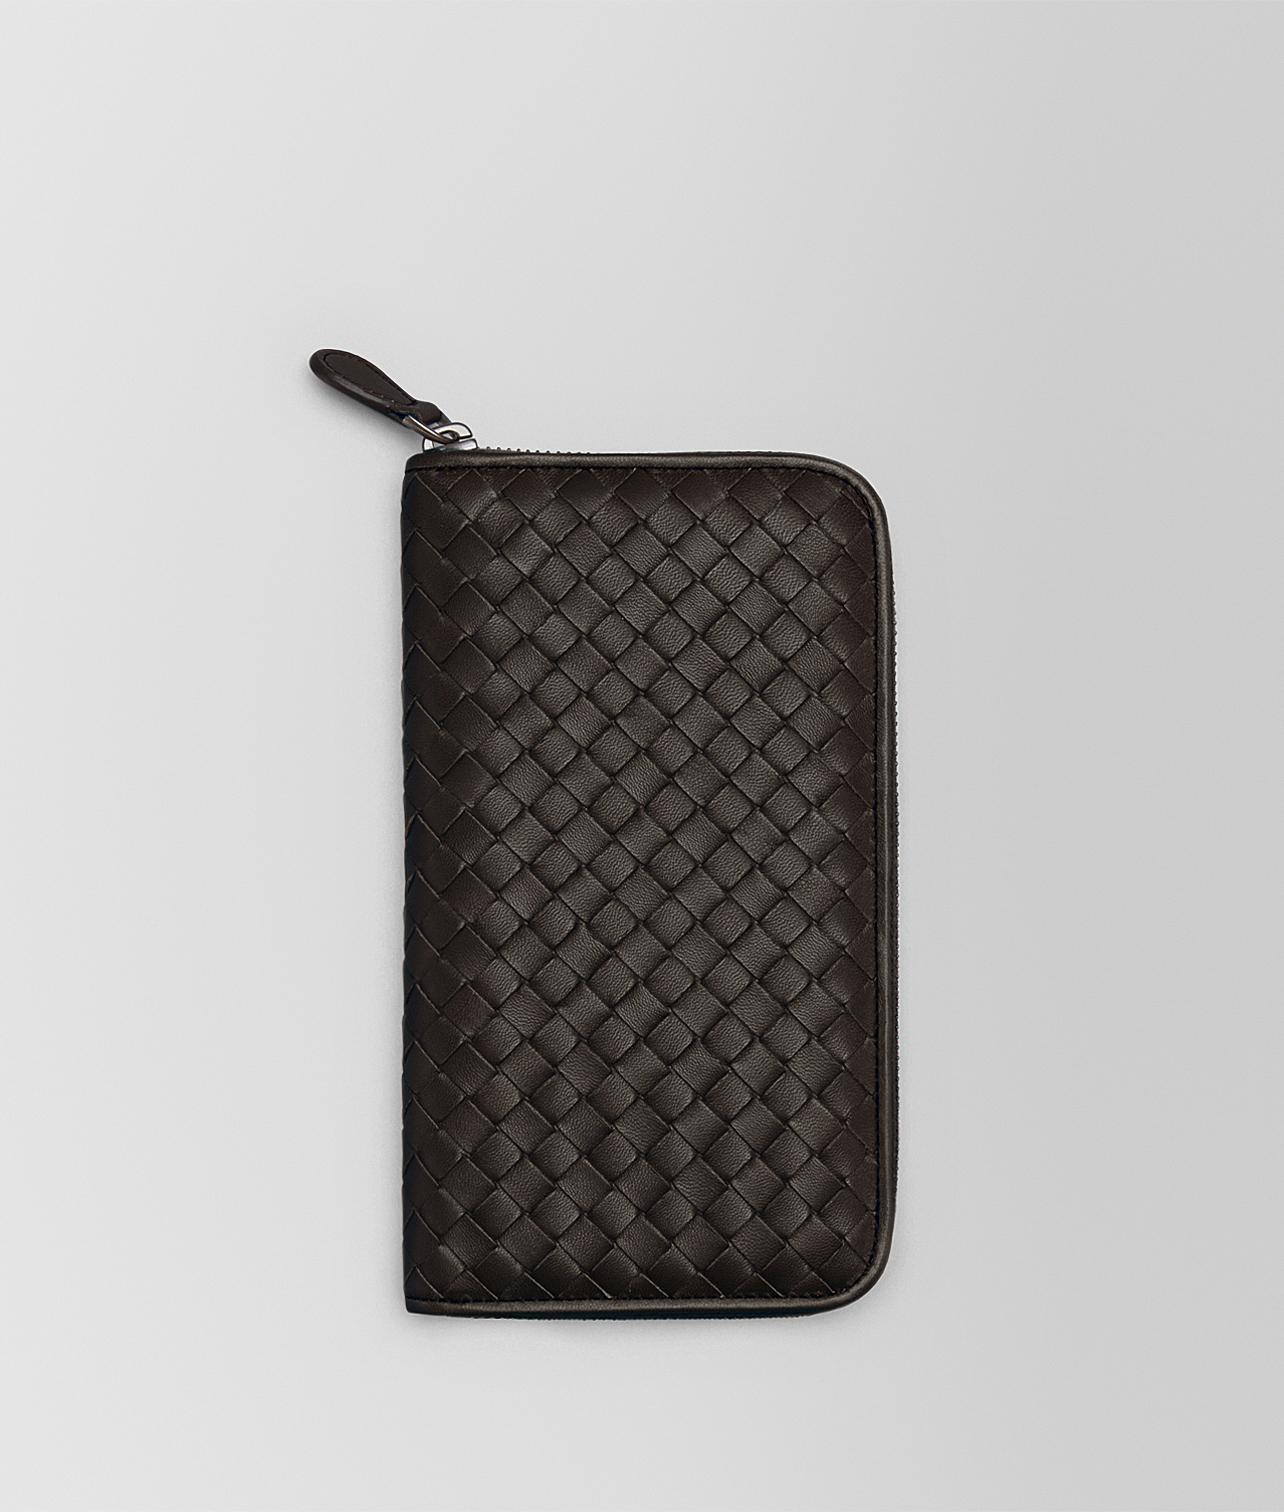 espresso Intrecciato nappa zip-around wallet - Brown Bottega Veneta v5qdP